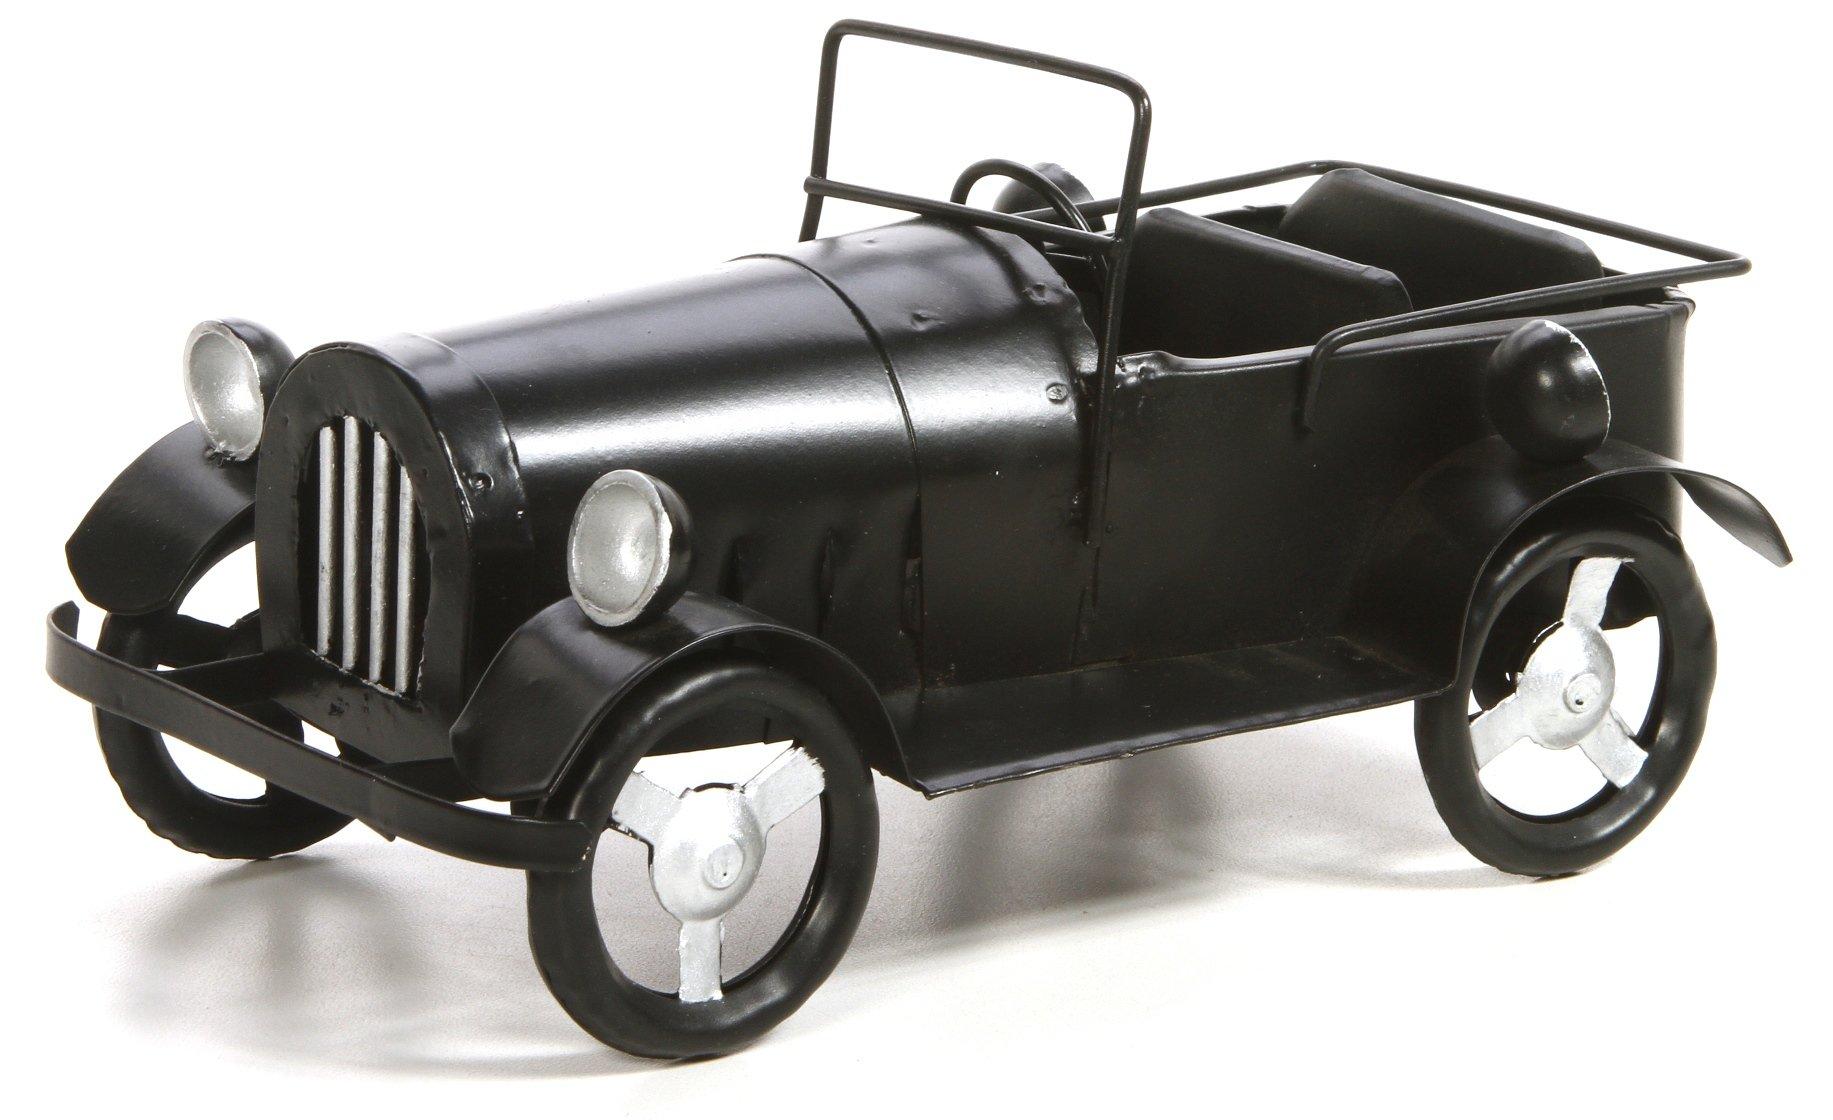 Hosley's 9'' Long, Decorative Tabletop Black Metal Vintage Car. Ideal Gift for Wedding, Home, Party Favor, Spa, Reiki, Meditation, Bathroom Settings.